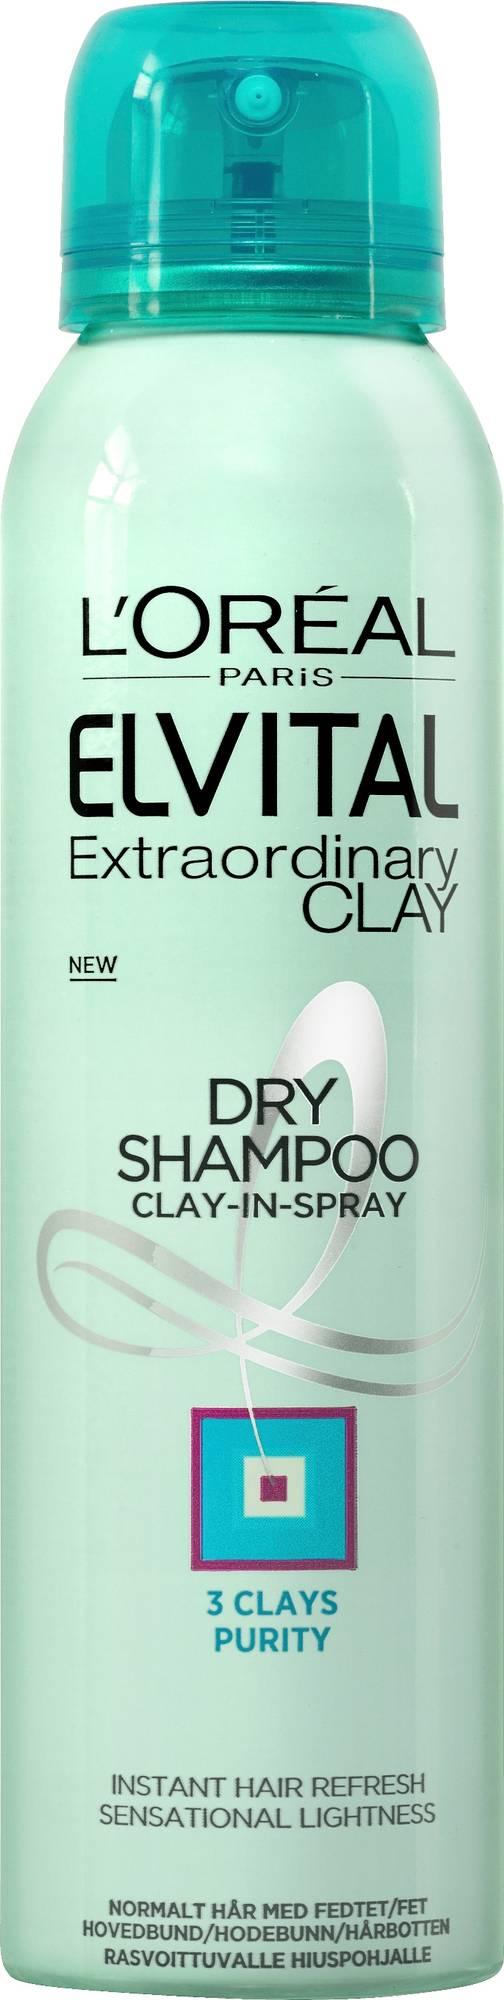 Extraordinary_Clay_Dry_Shampoo_Png_print